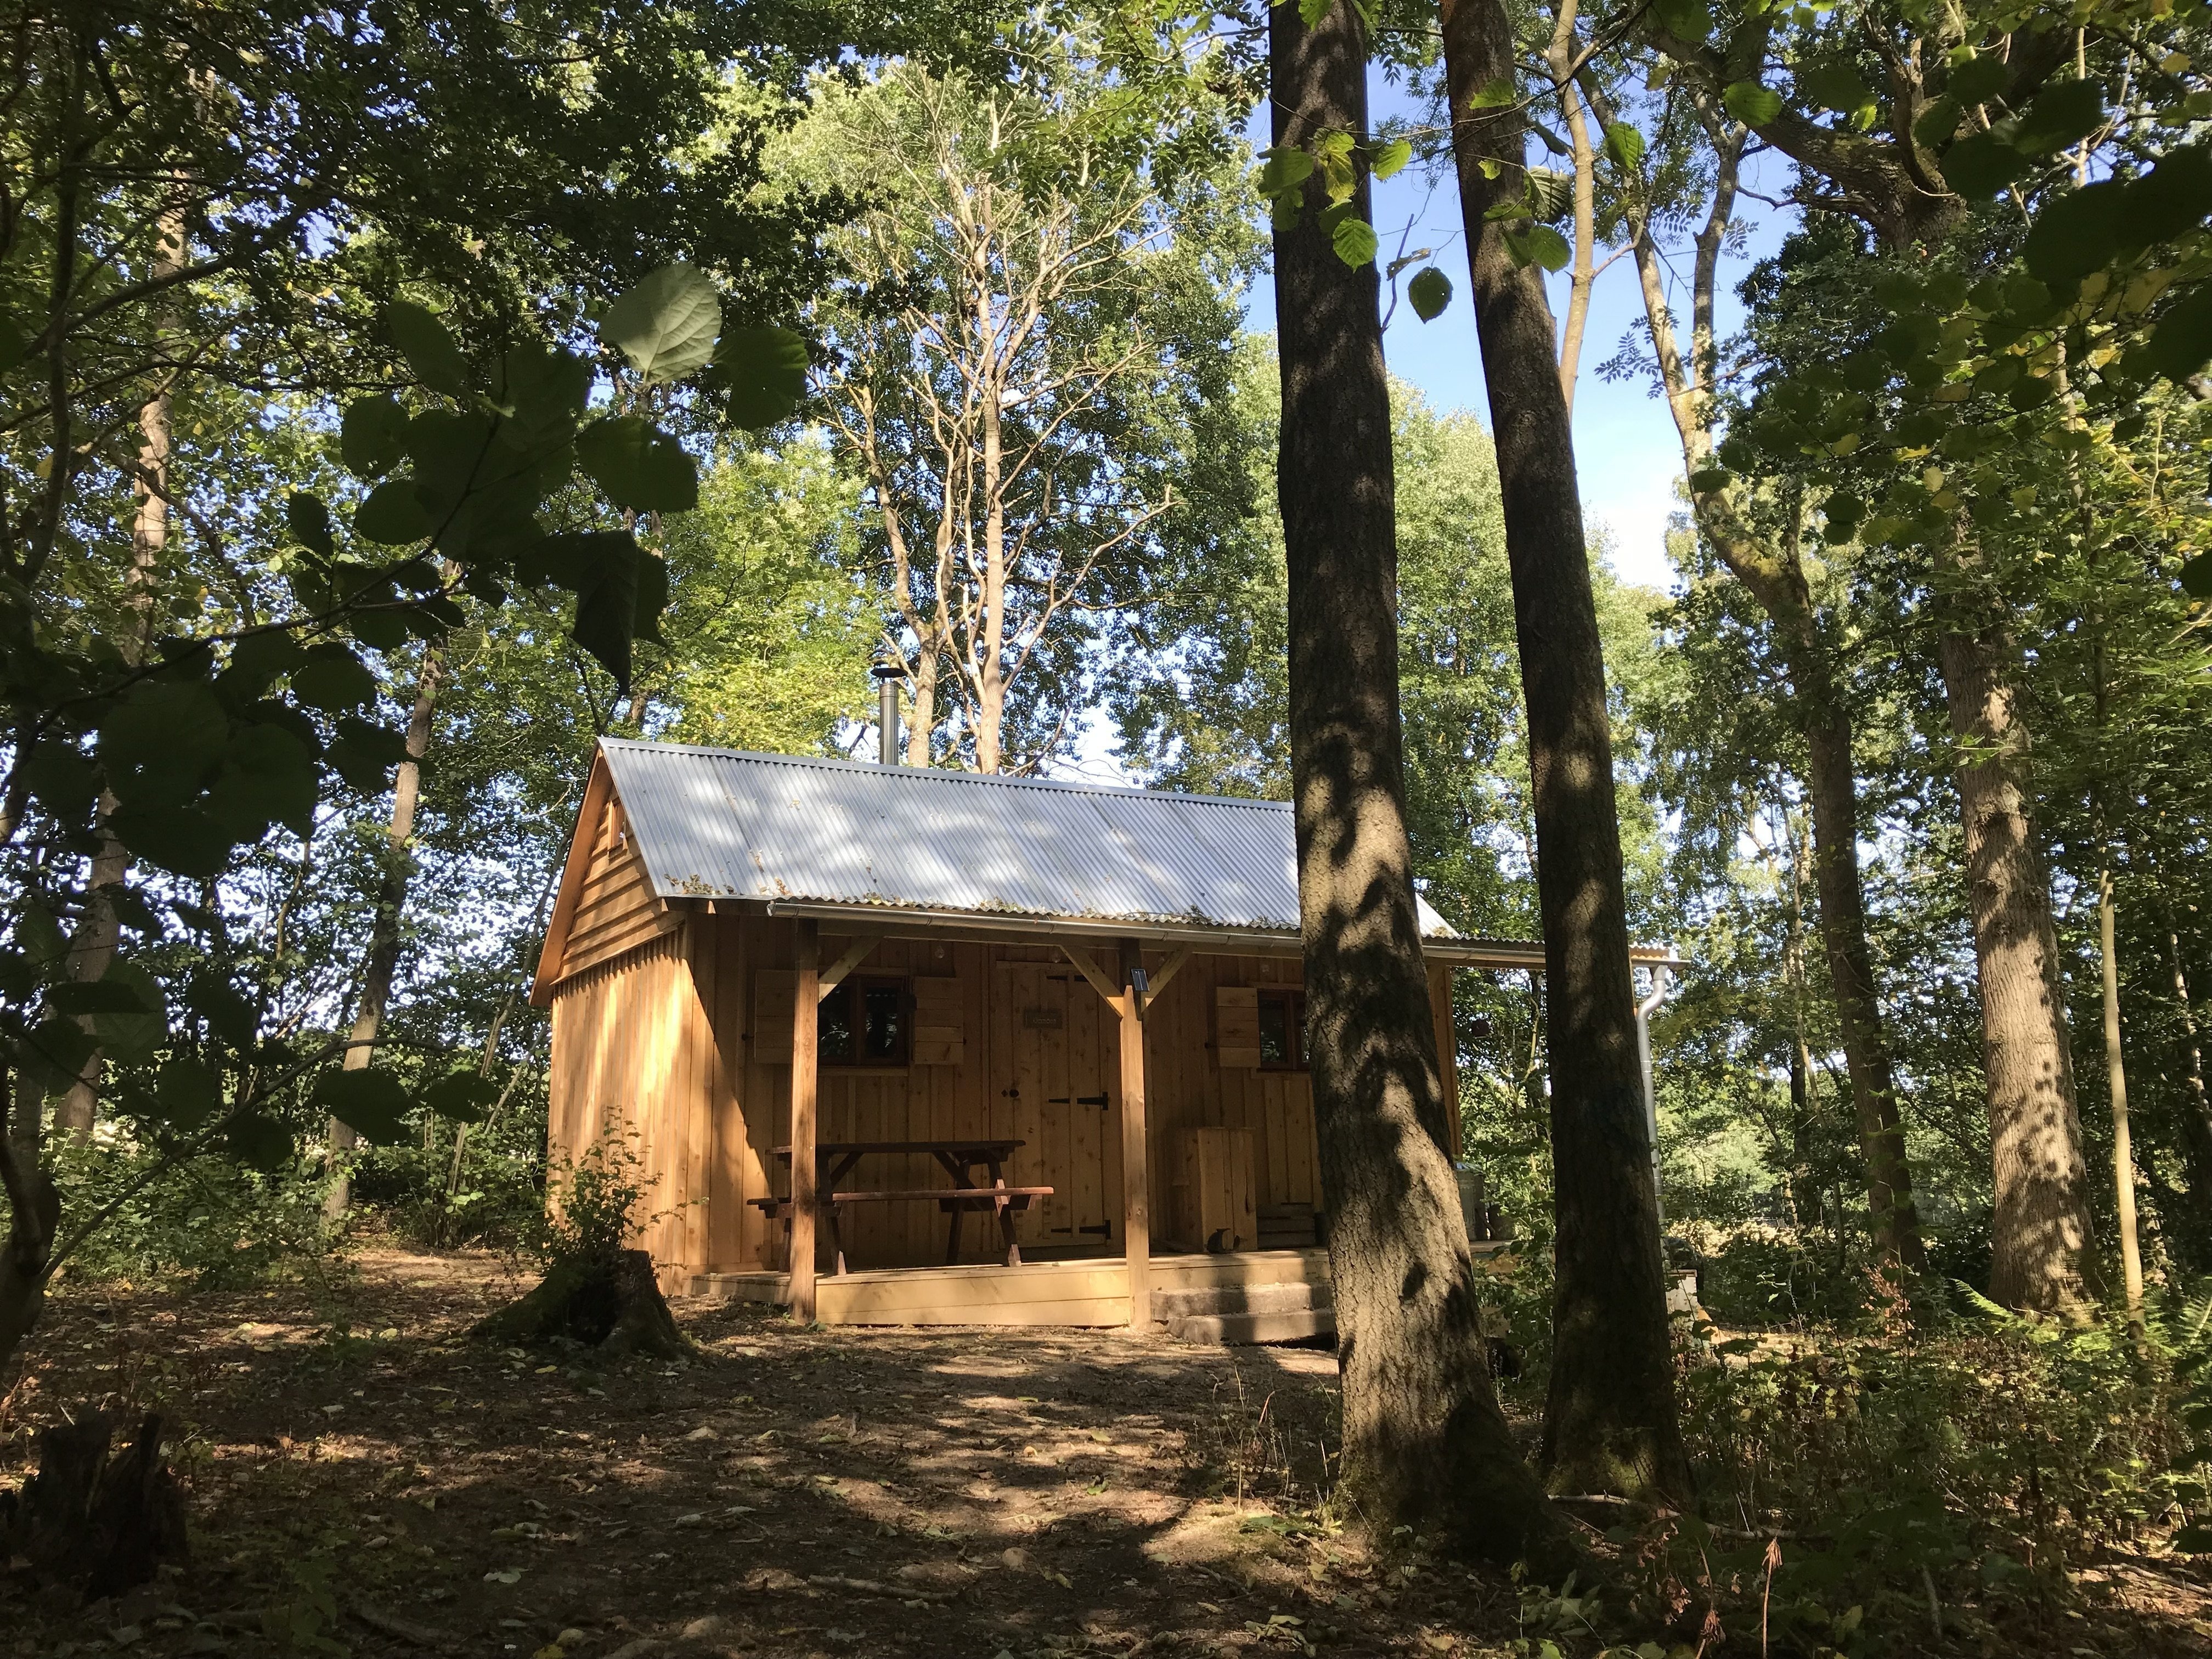 orinoco cabin